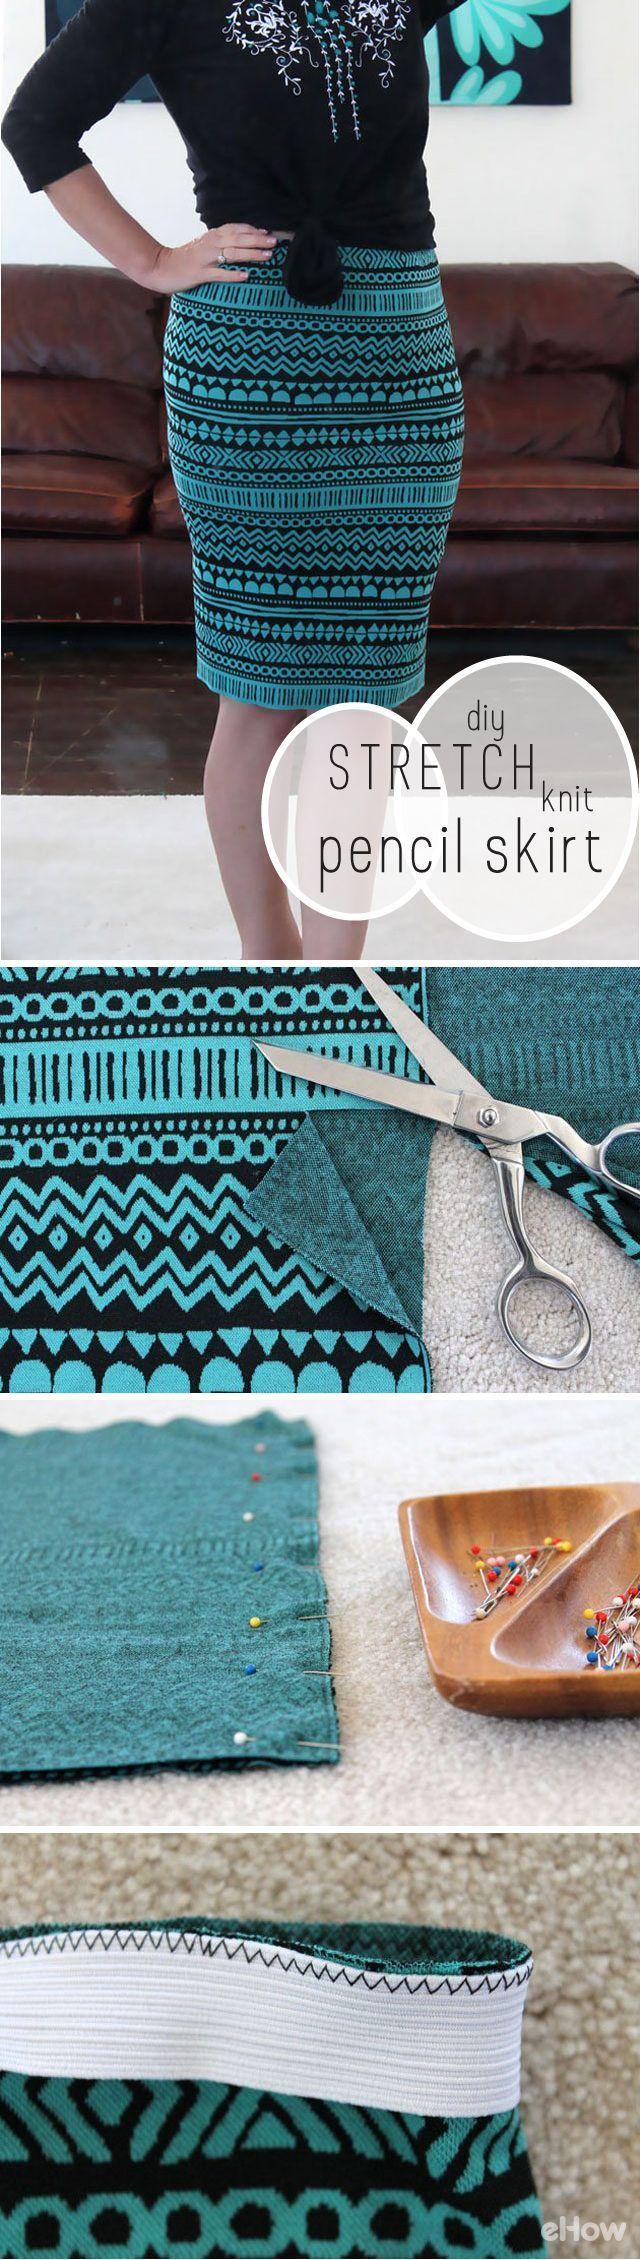 DIY Stretch Knit Pencil Skirt | Nähen, Rock und Diy nähen